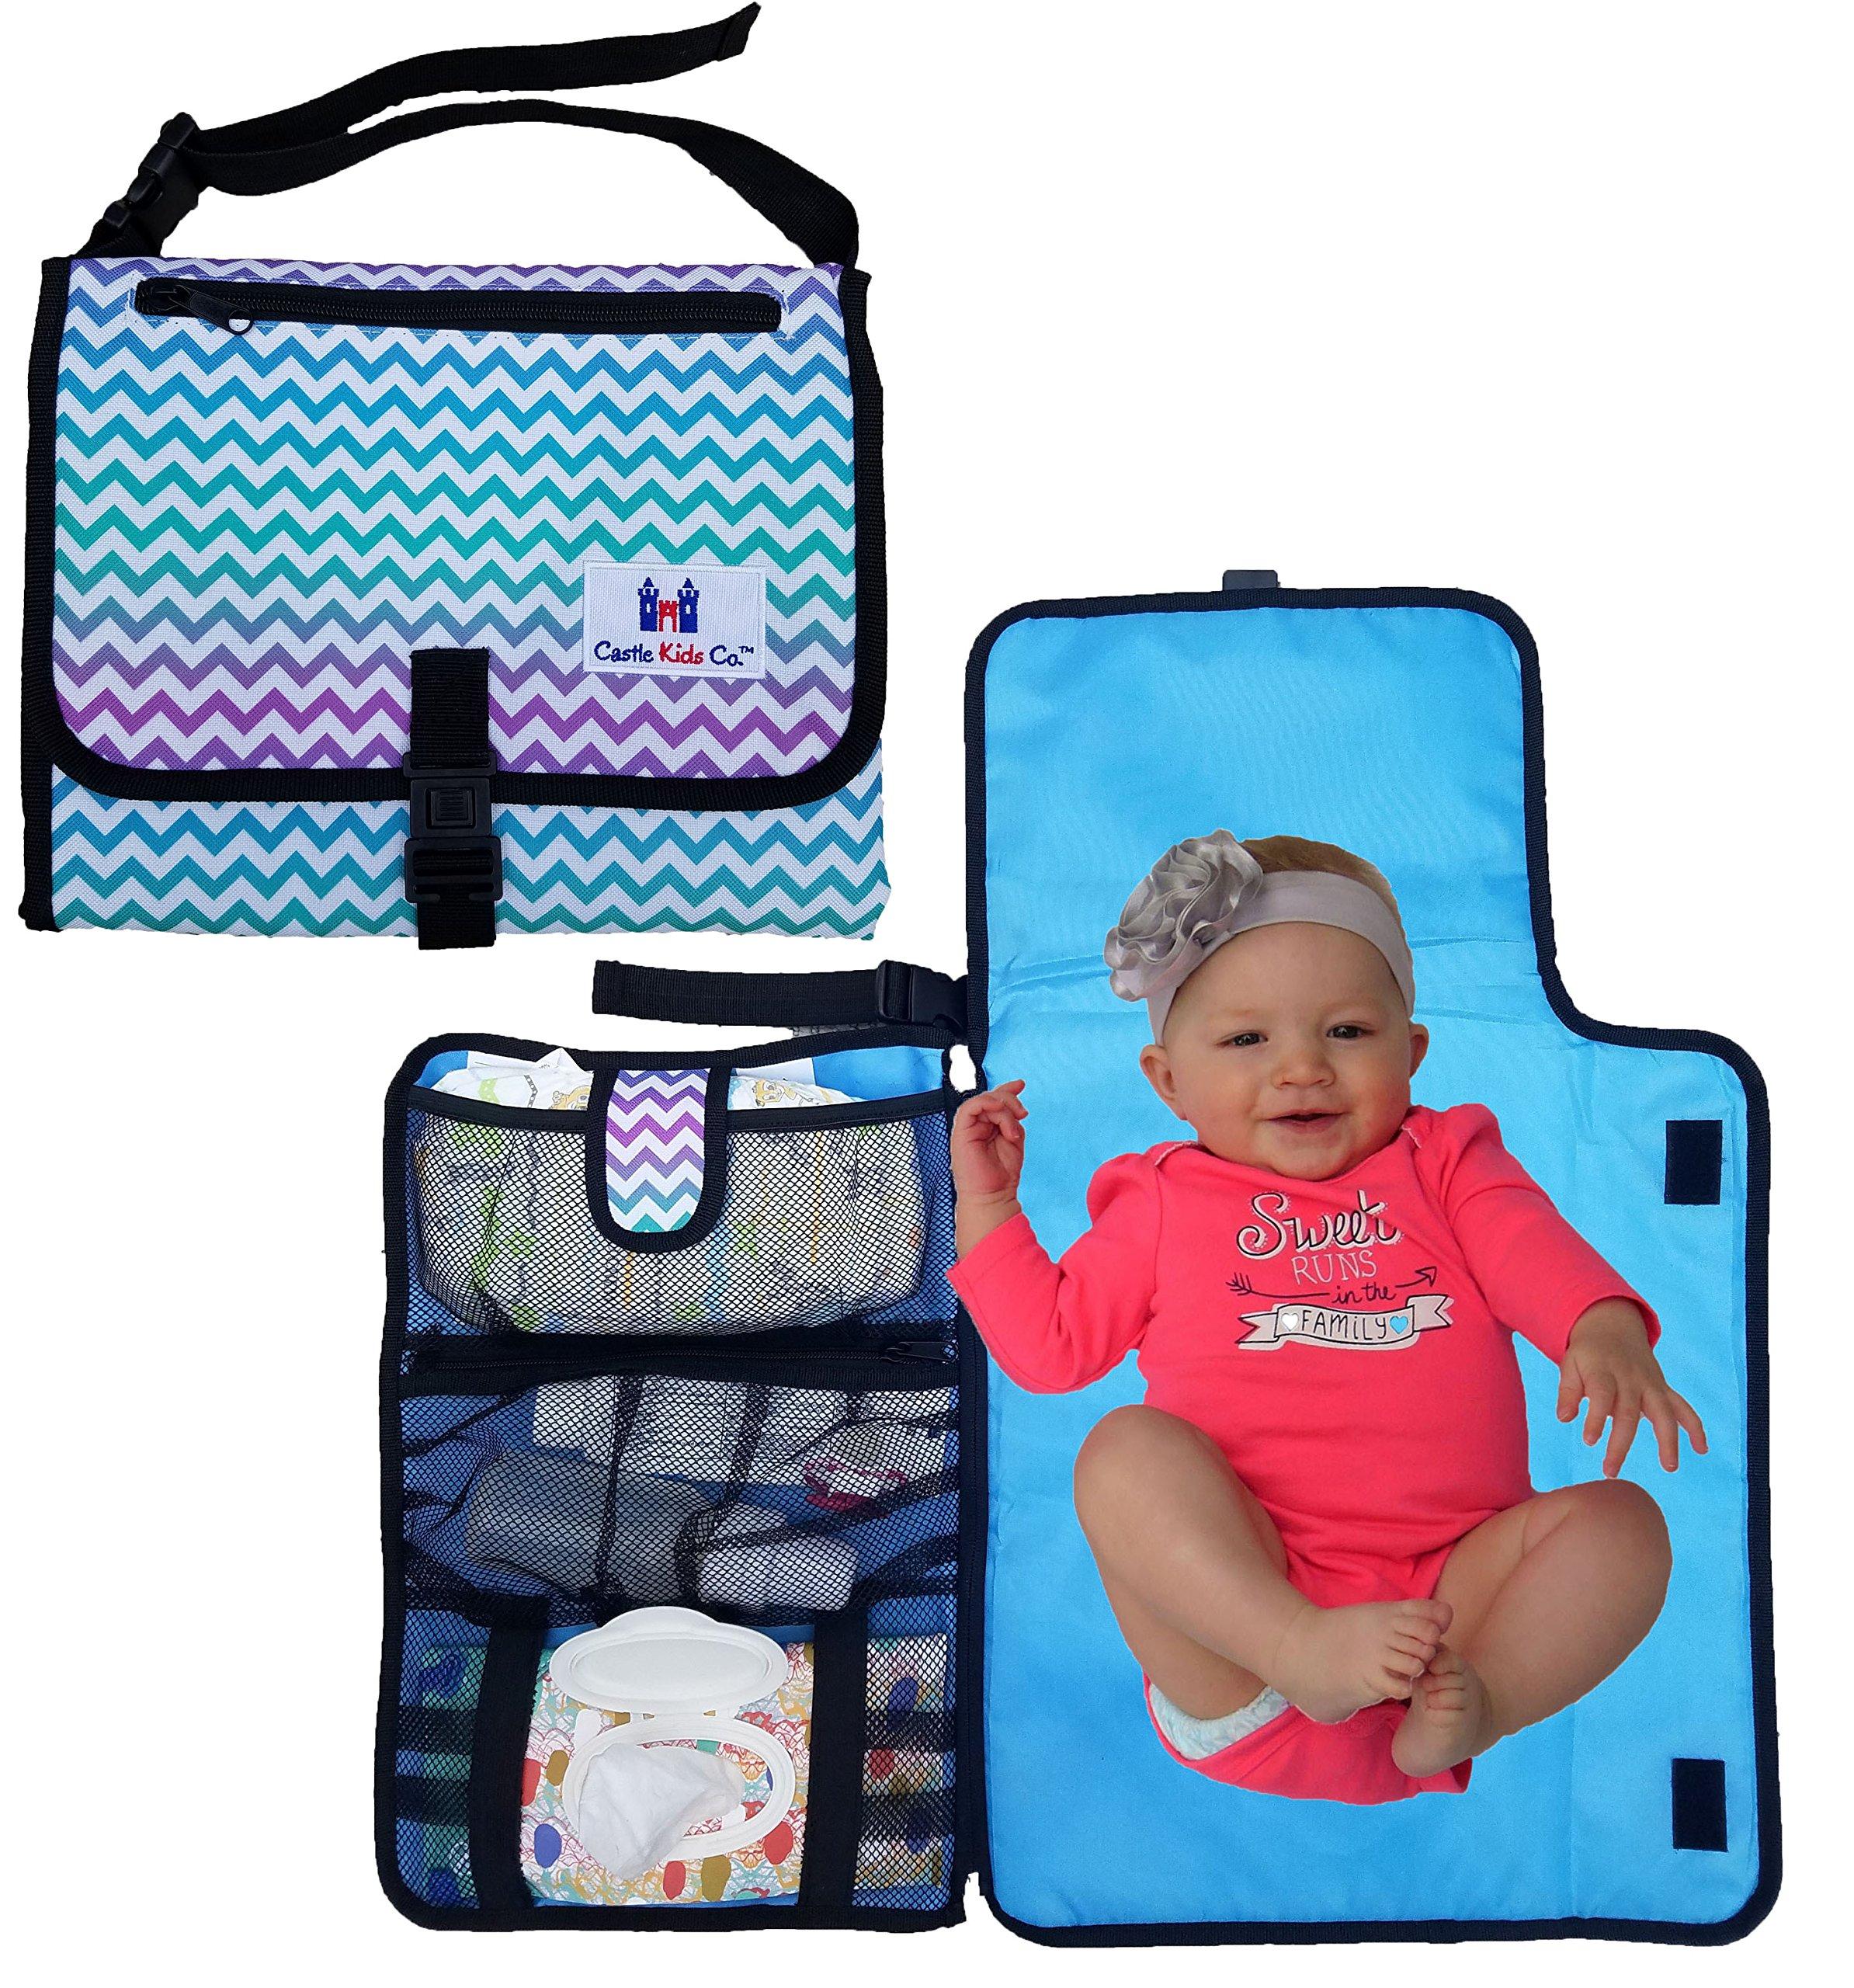 b0128a0a898b Amazon.com   Castle Kids Co Diaper Changing Pad - Luxury Clutch ...